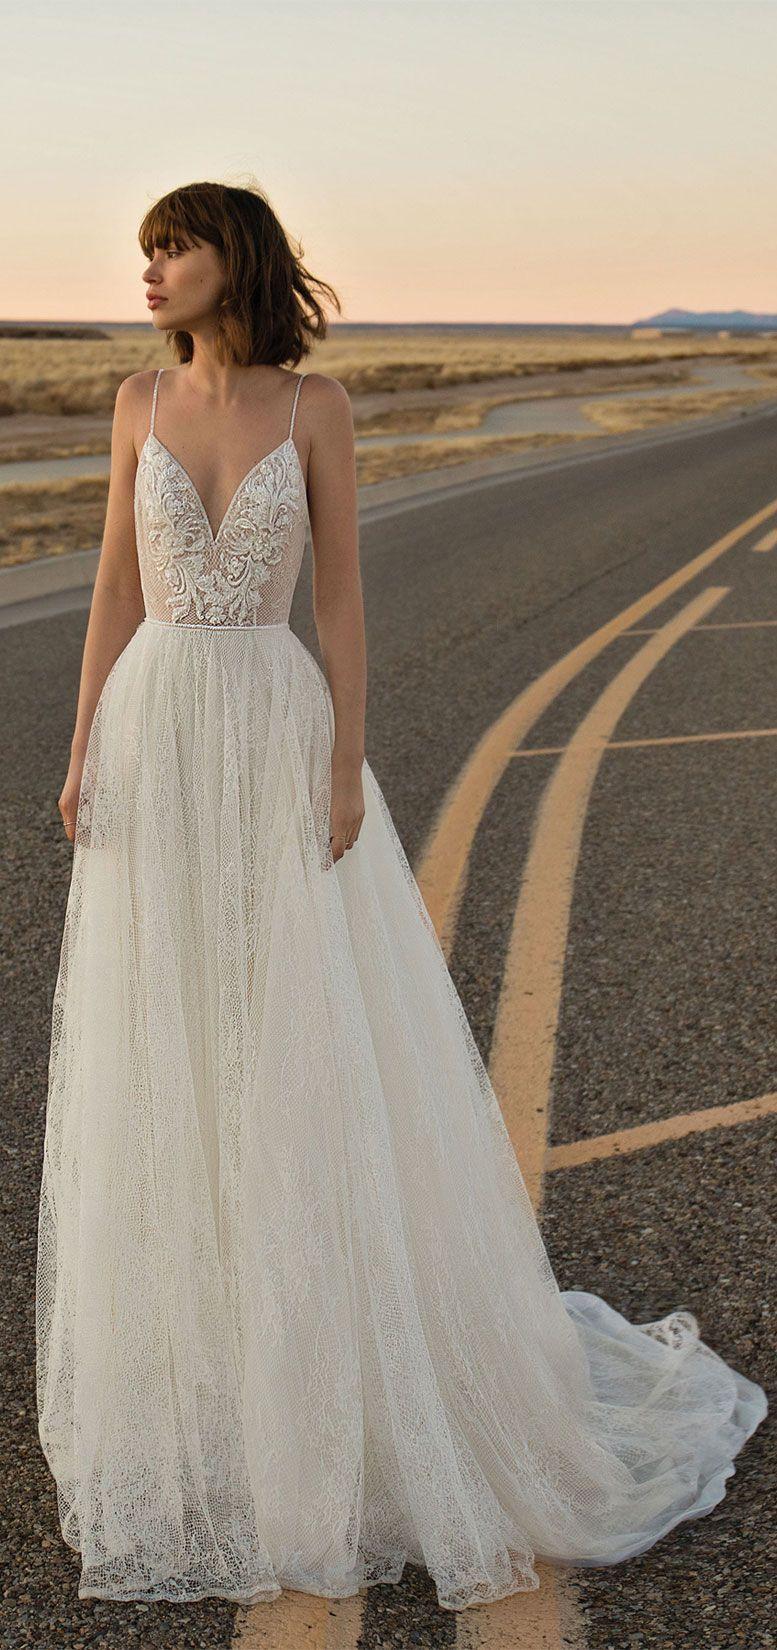 Photo of Flora Bride Siren Of The Desert 2019 Bridal Collection